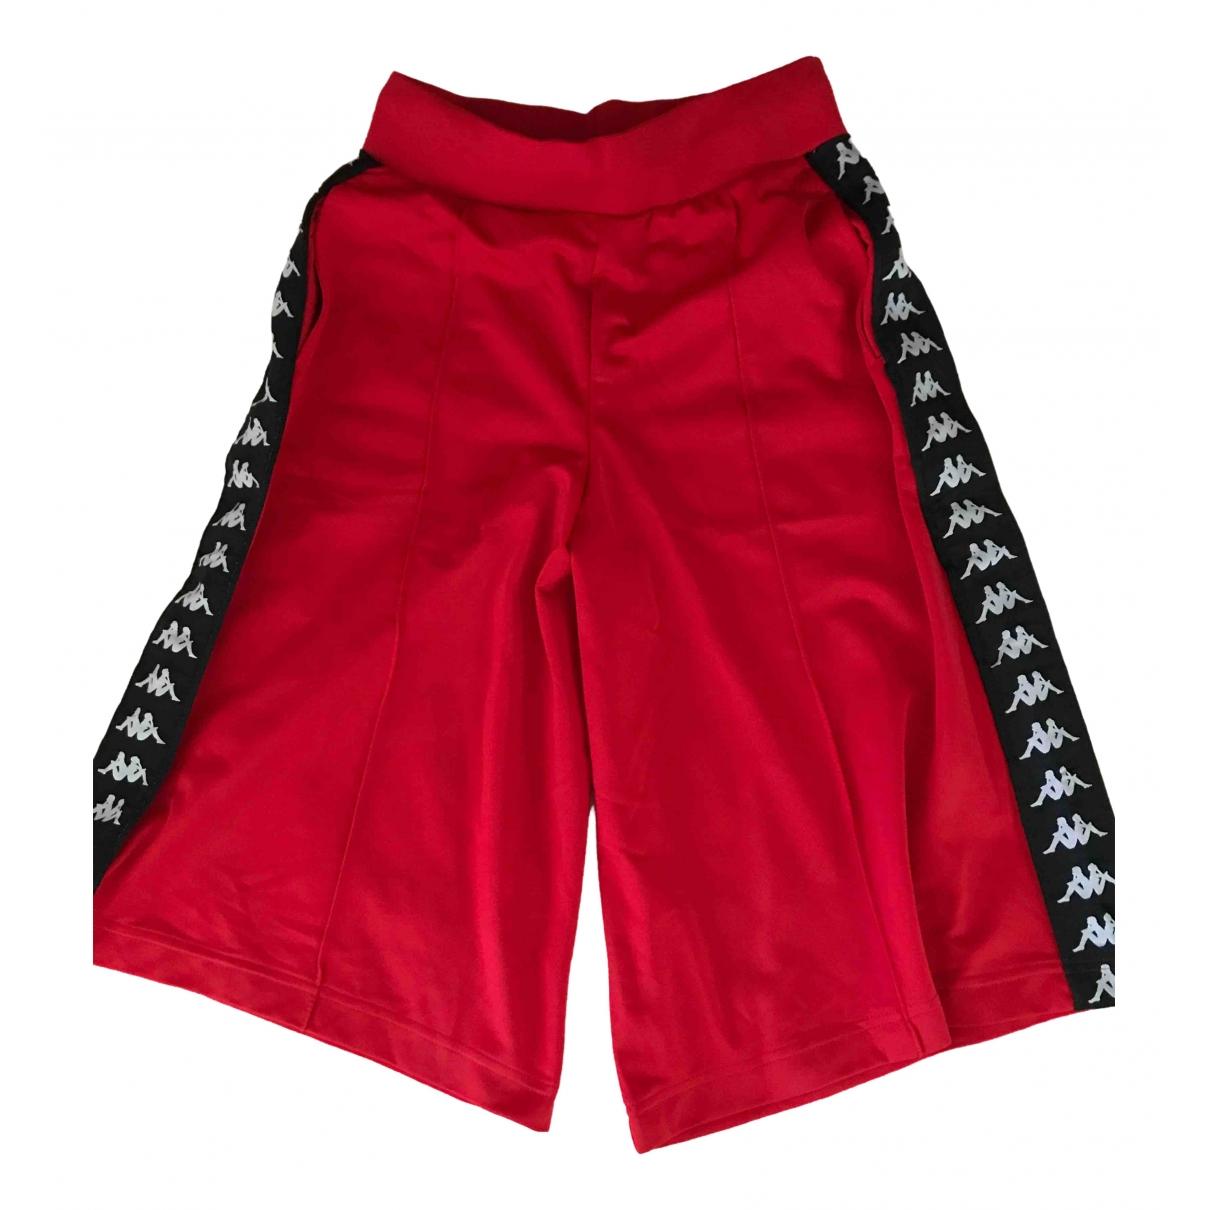 Kappa \N Red Shorts for Women XS International